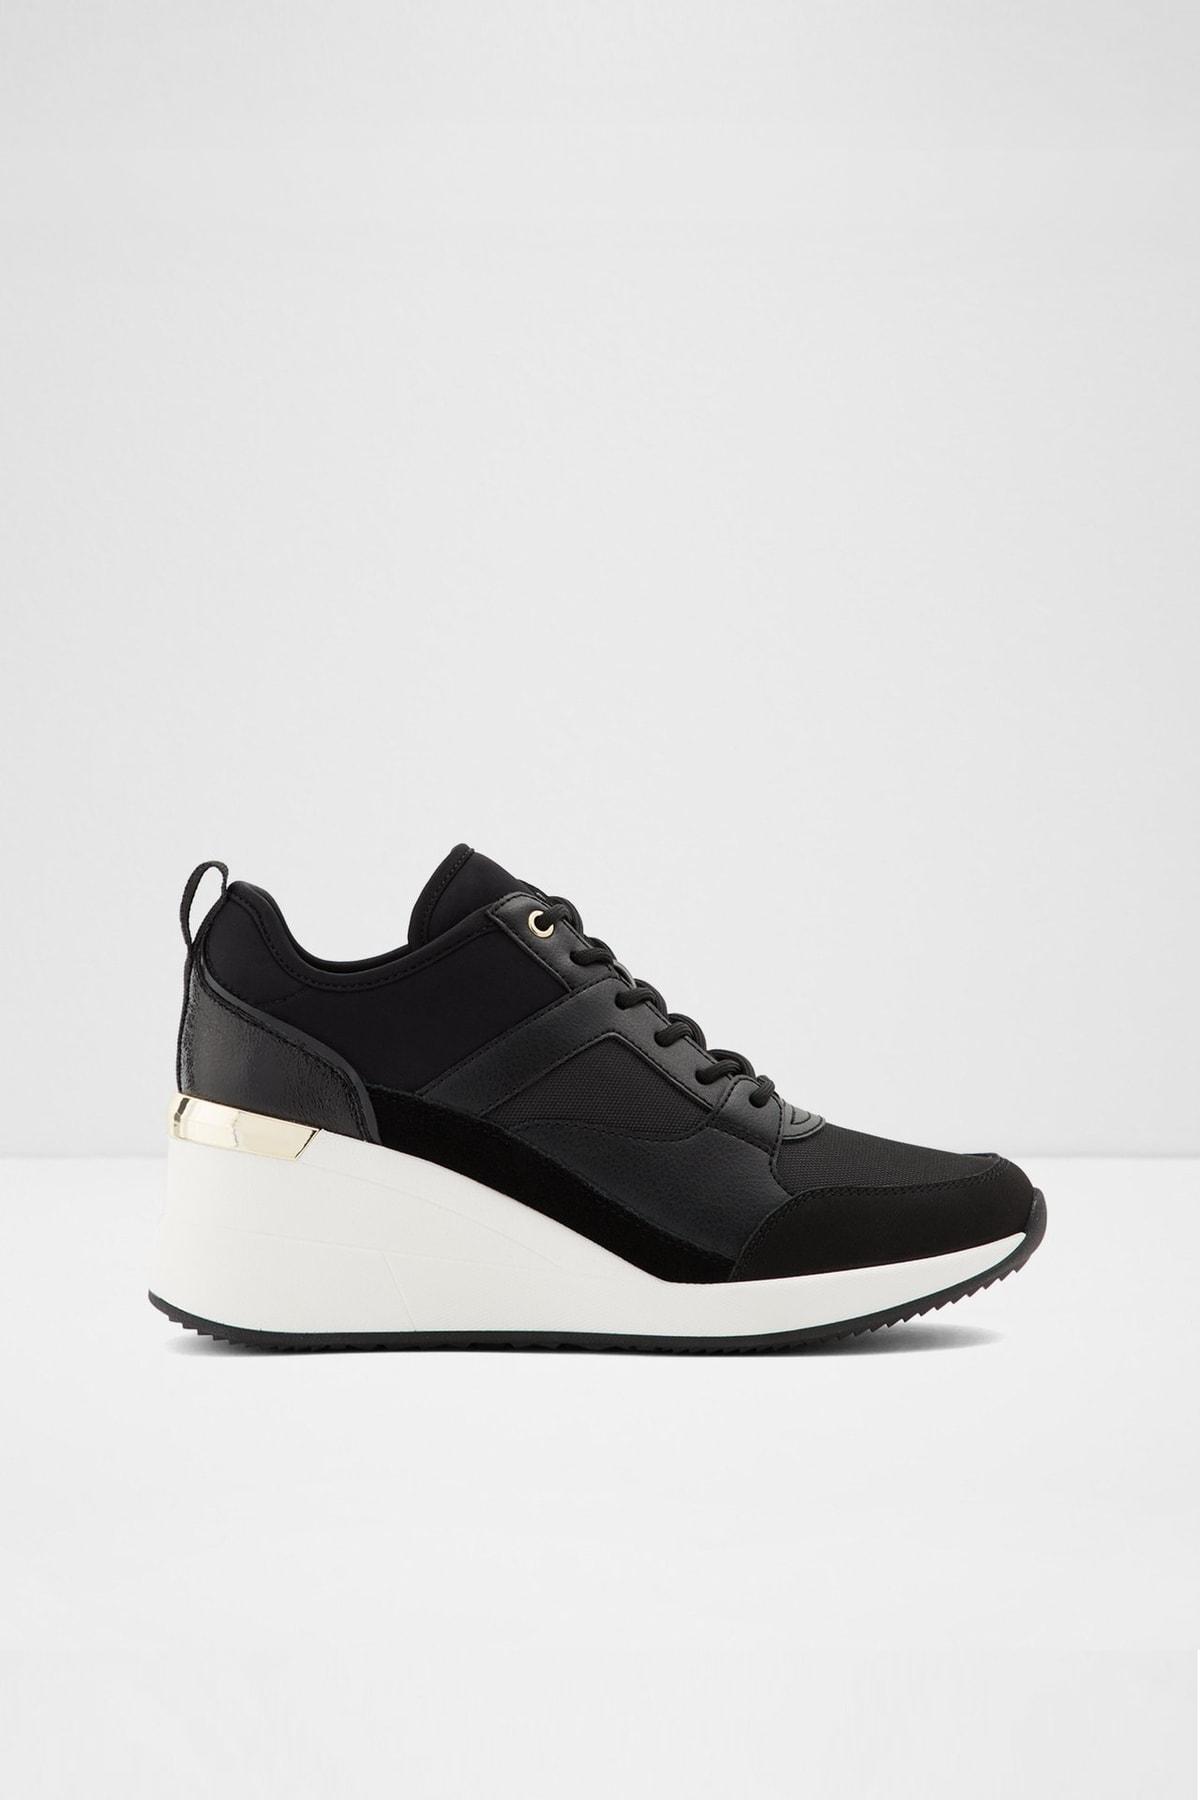 Aldo Thrundra - Siyah Kadın Sneaker 1